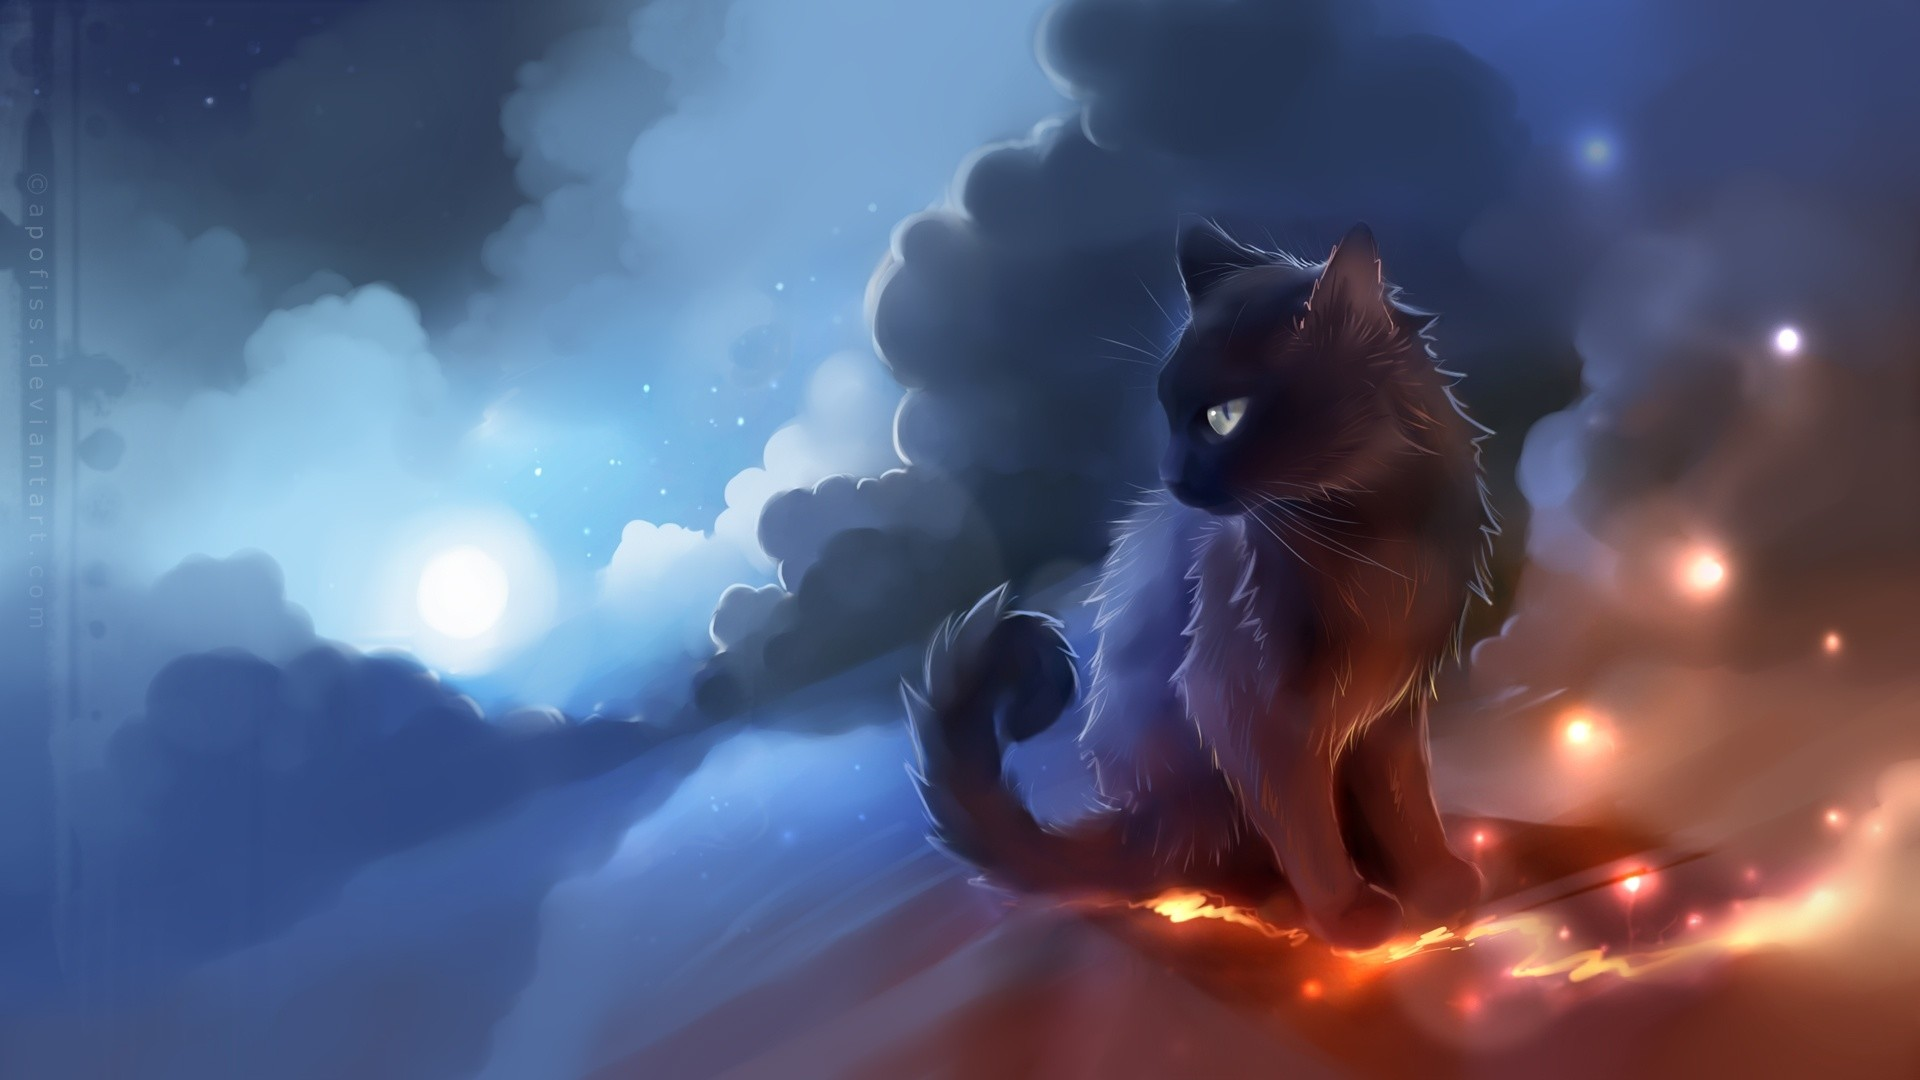 Cute Anime Cat Wallpaper 62 Images